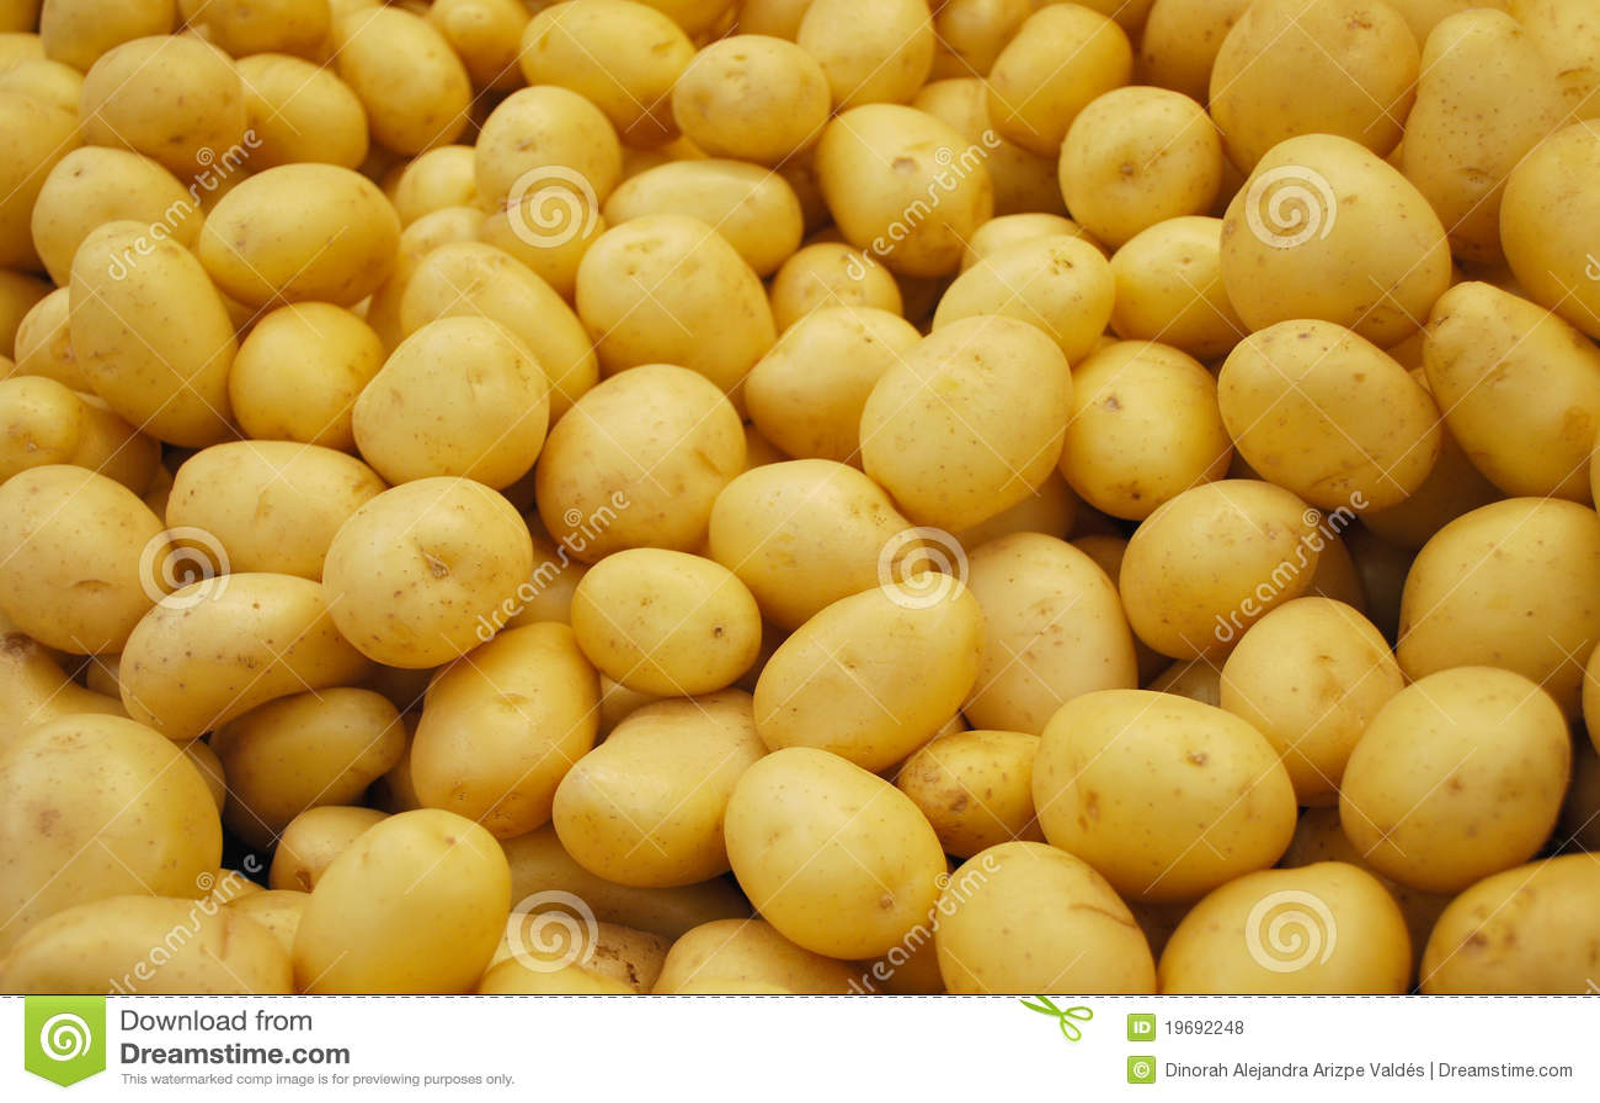 Potatoes stand